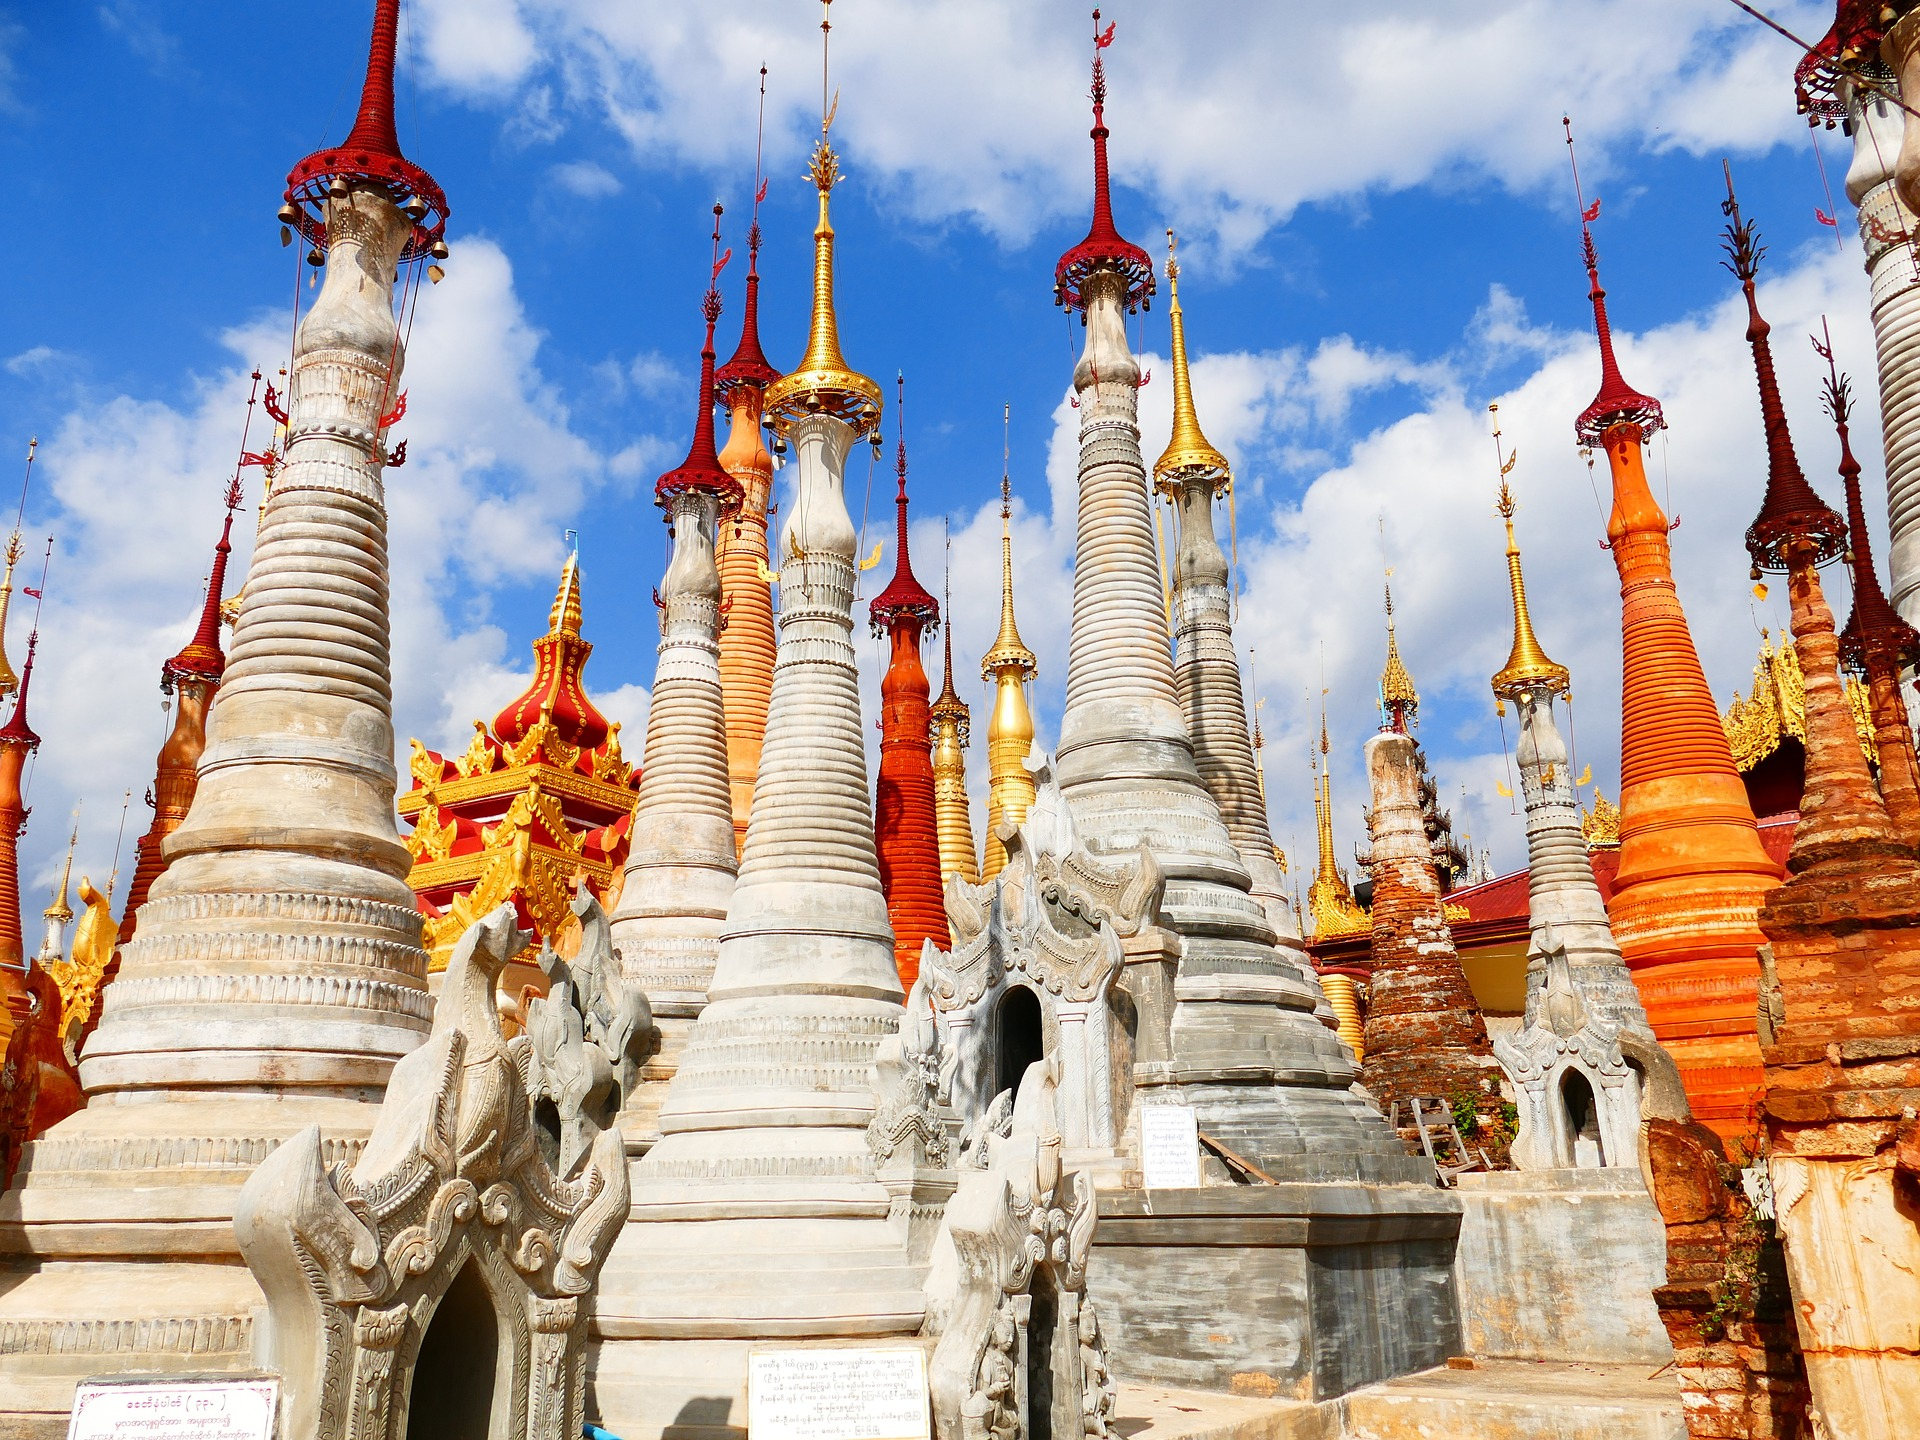 Храм, Мьянма, Бирма, Пагода, Ступа - Обои HD - Профессор falken.com